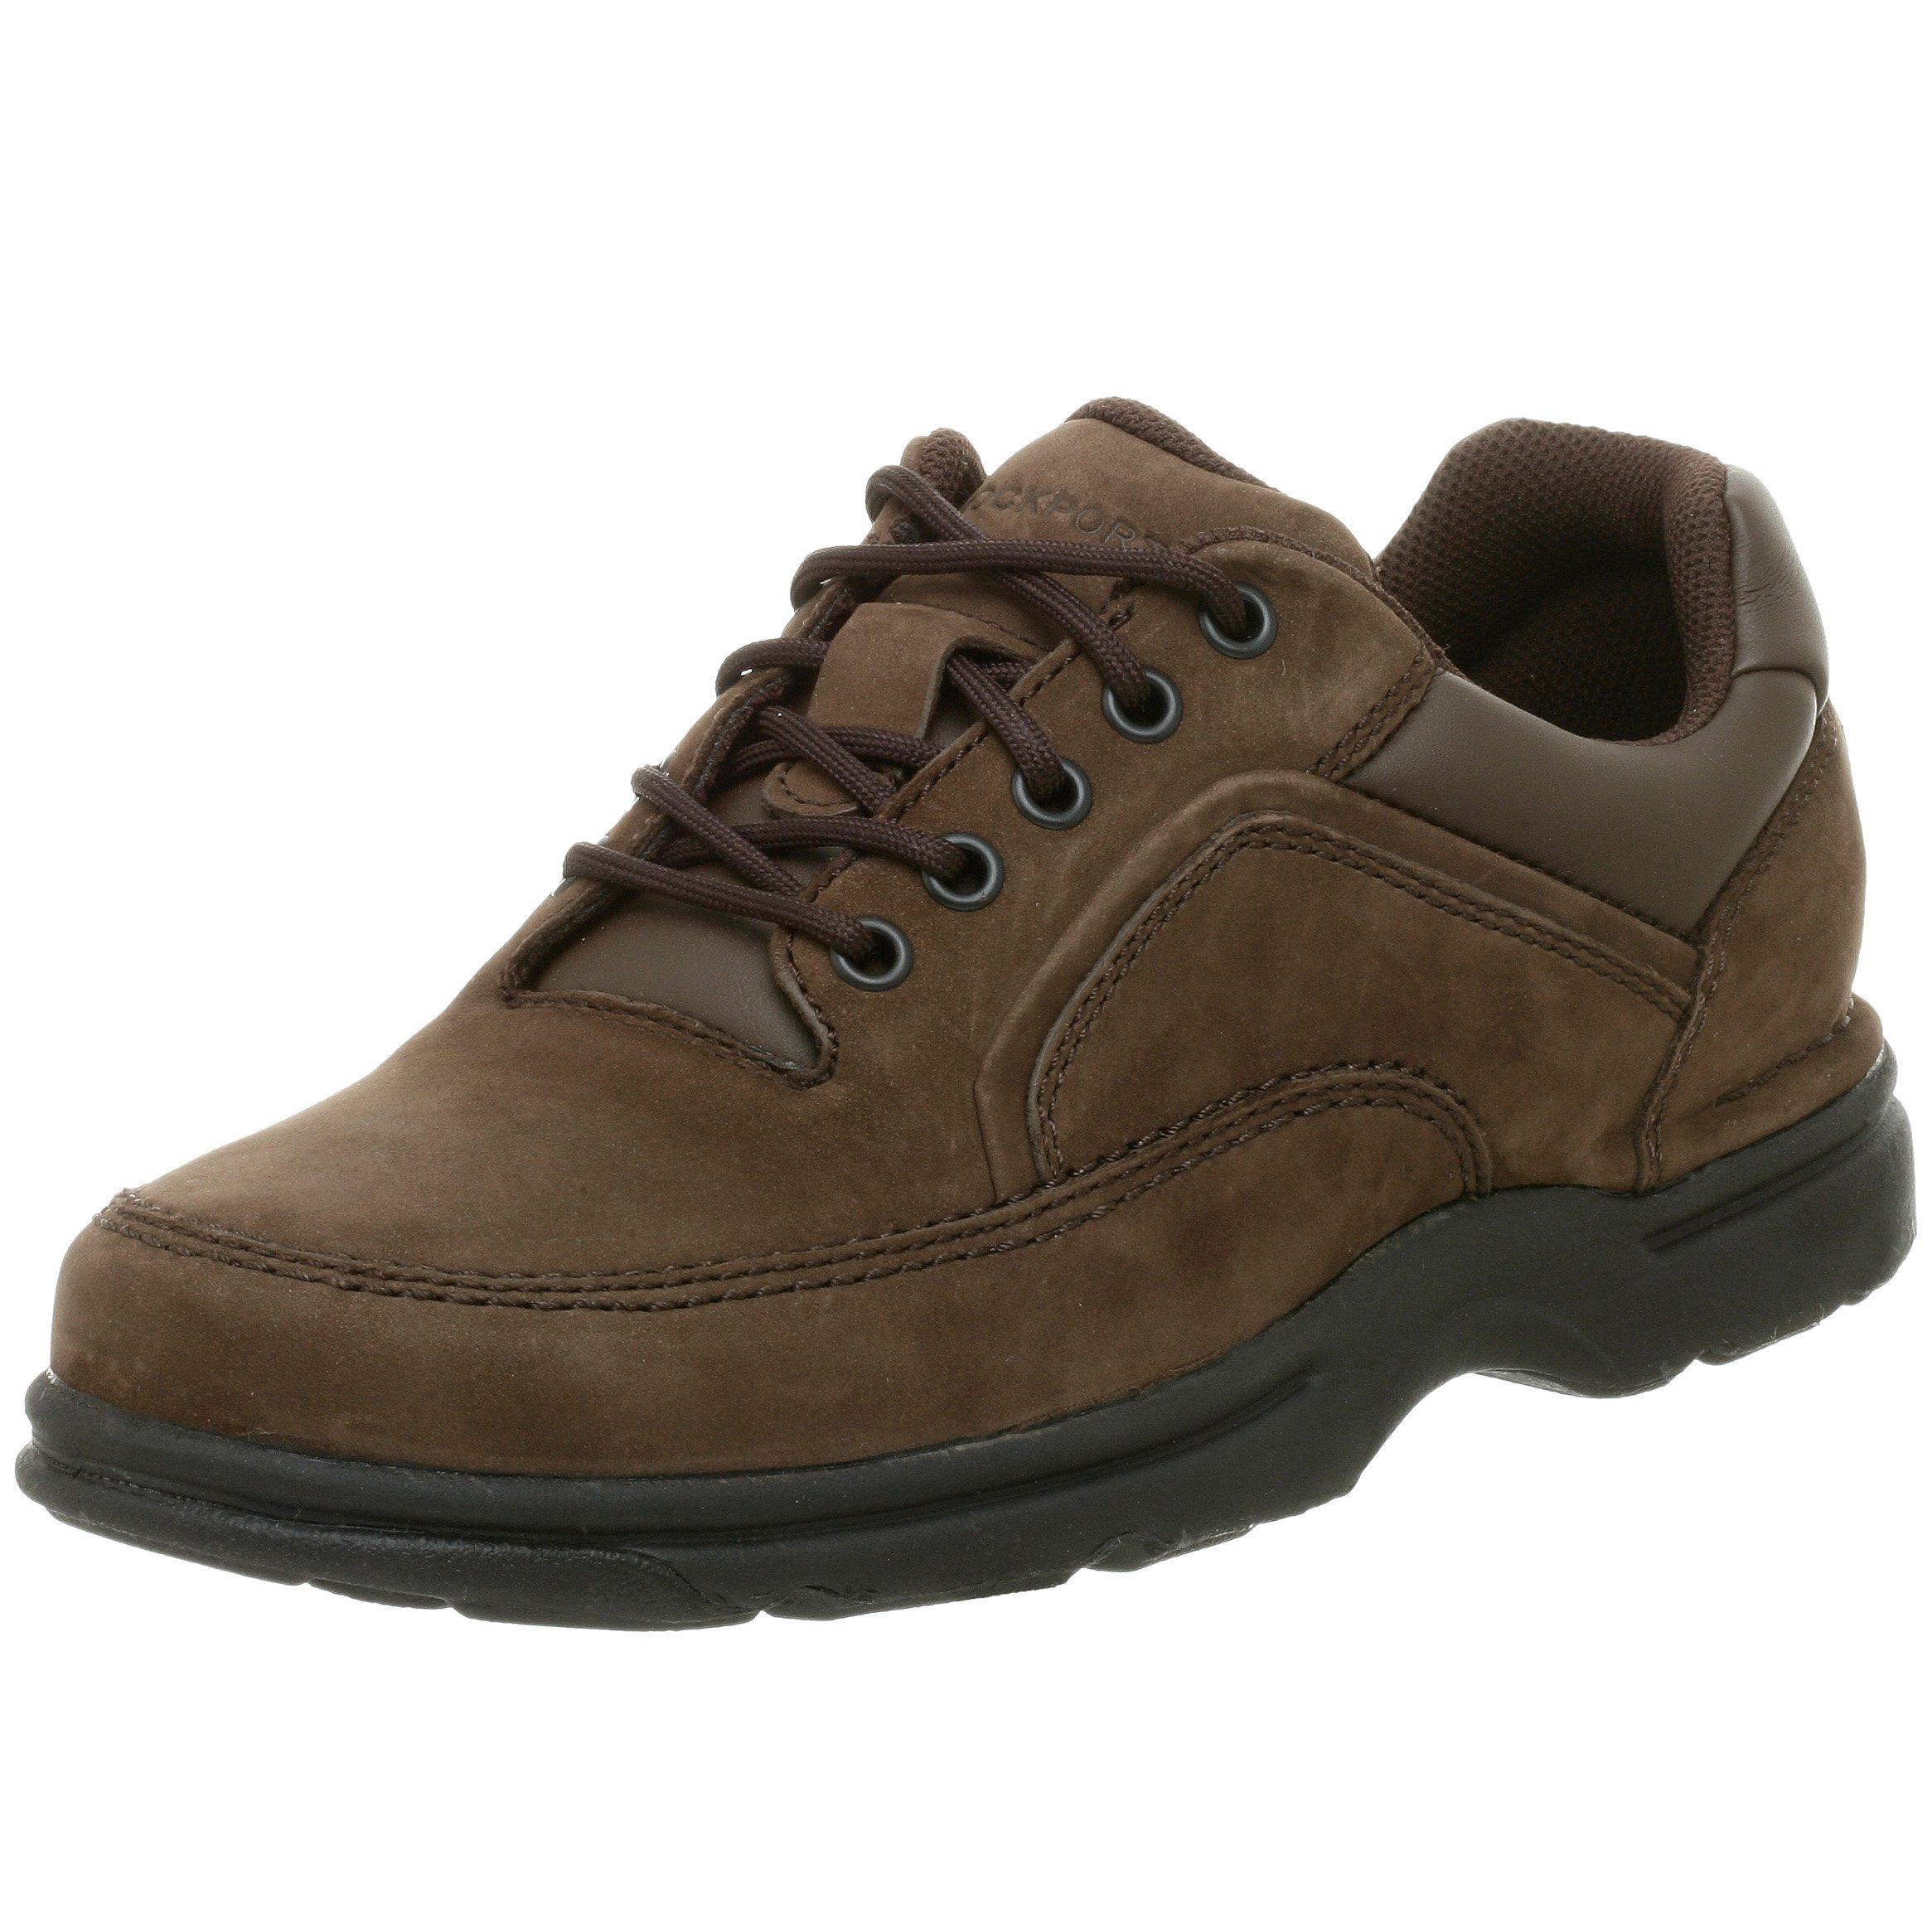 Rockport Men's Eureka Walking Shoe-Chocolate-12  M by Rockport